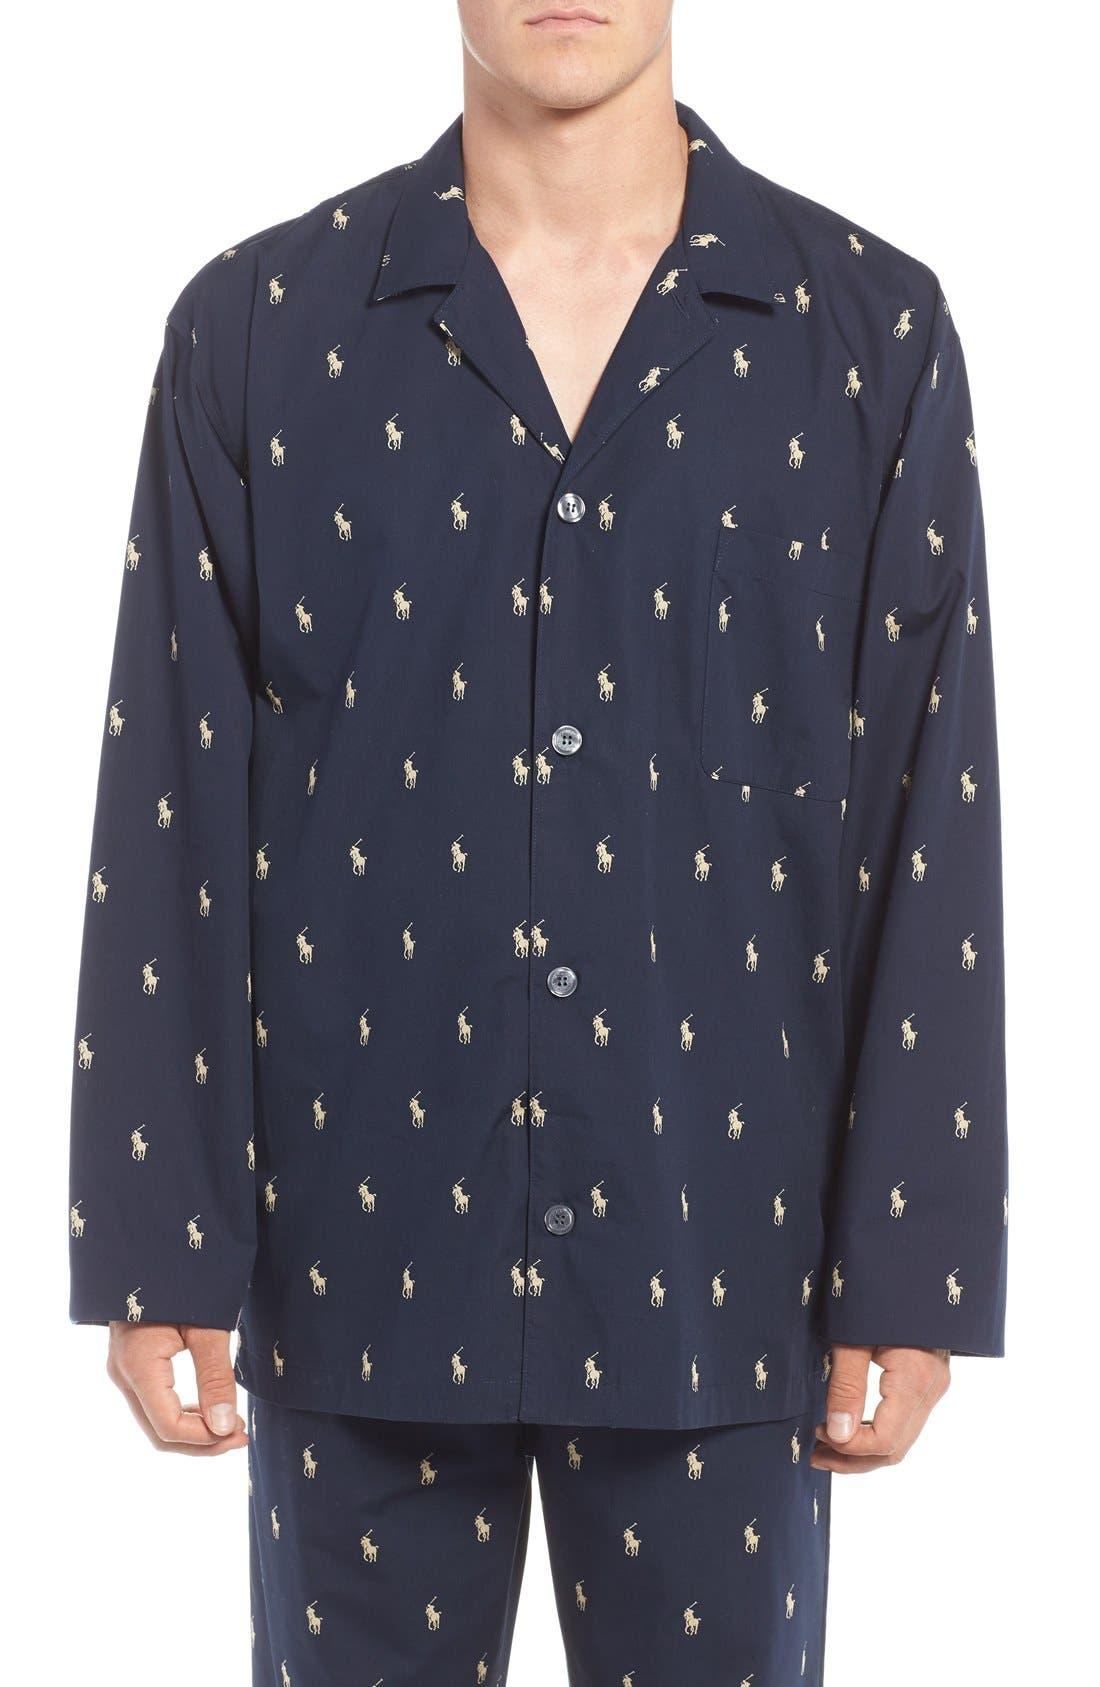 Polo Ralph Lauren 'Polo Player' Embroidered Pajama Top